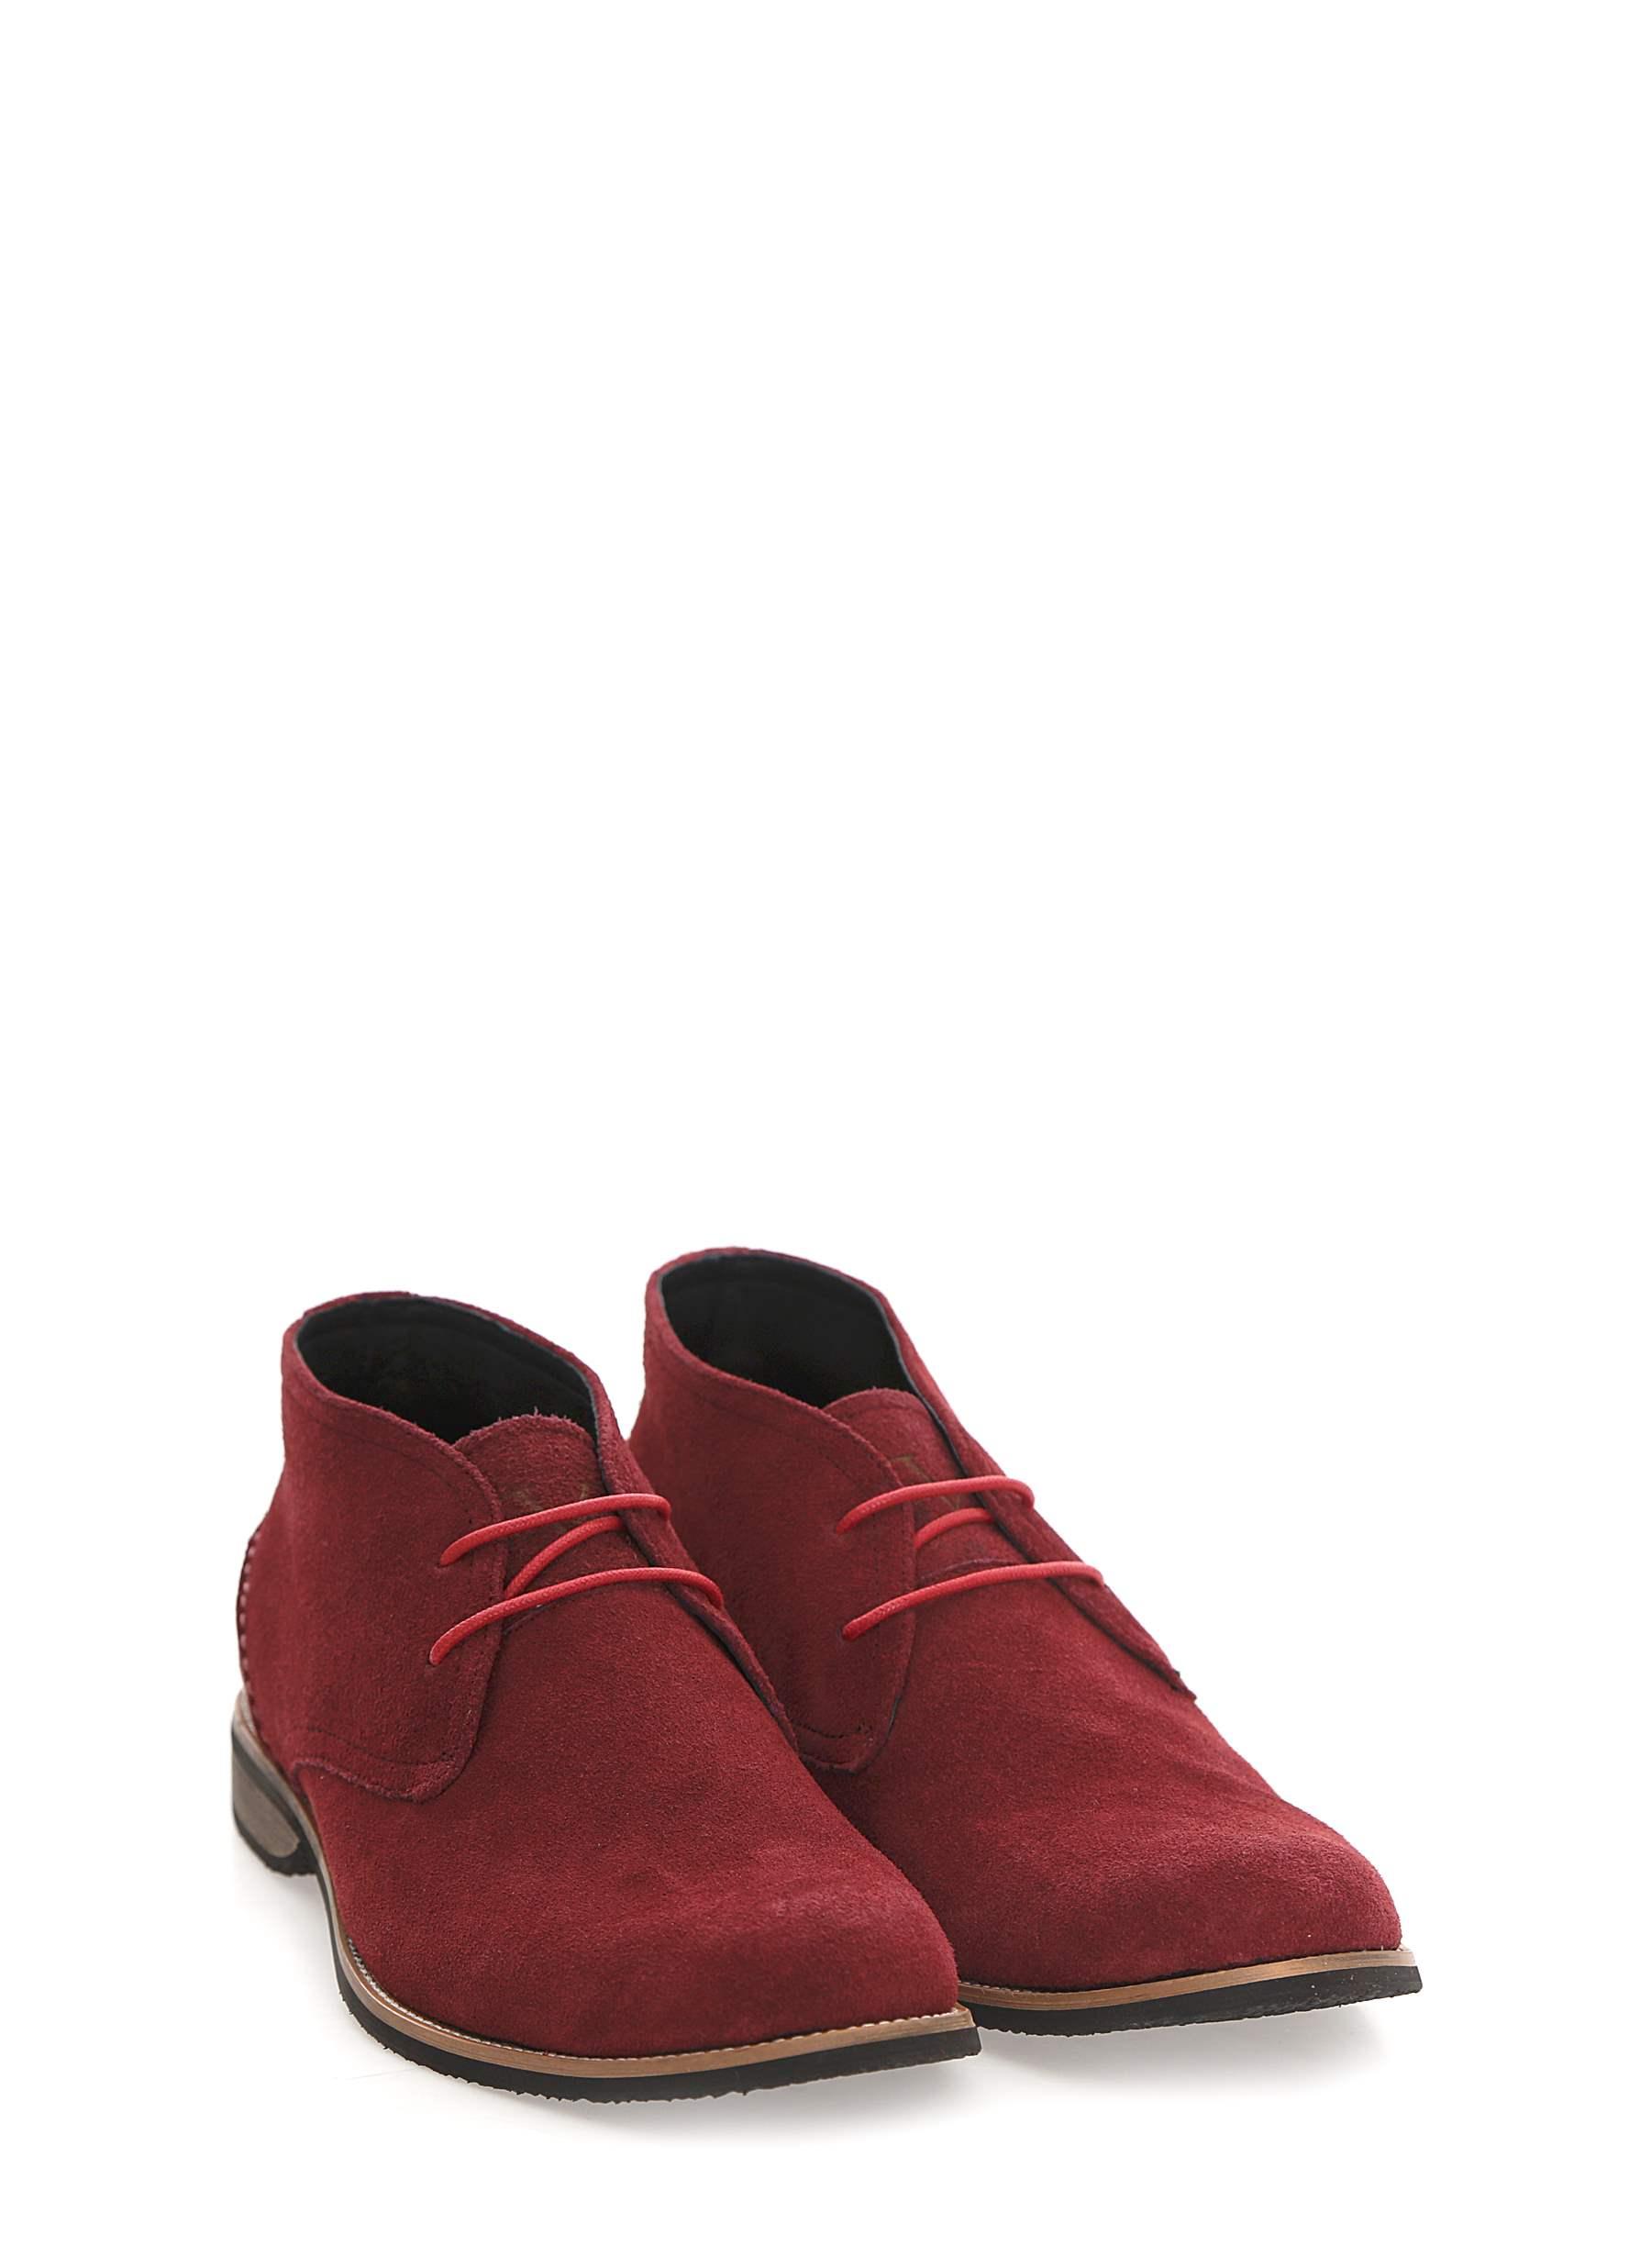 19V69 Shoes - Ανδρικά Υποδήματα VERSACE 1969